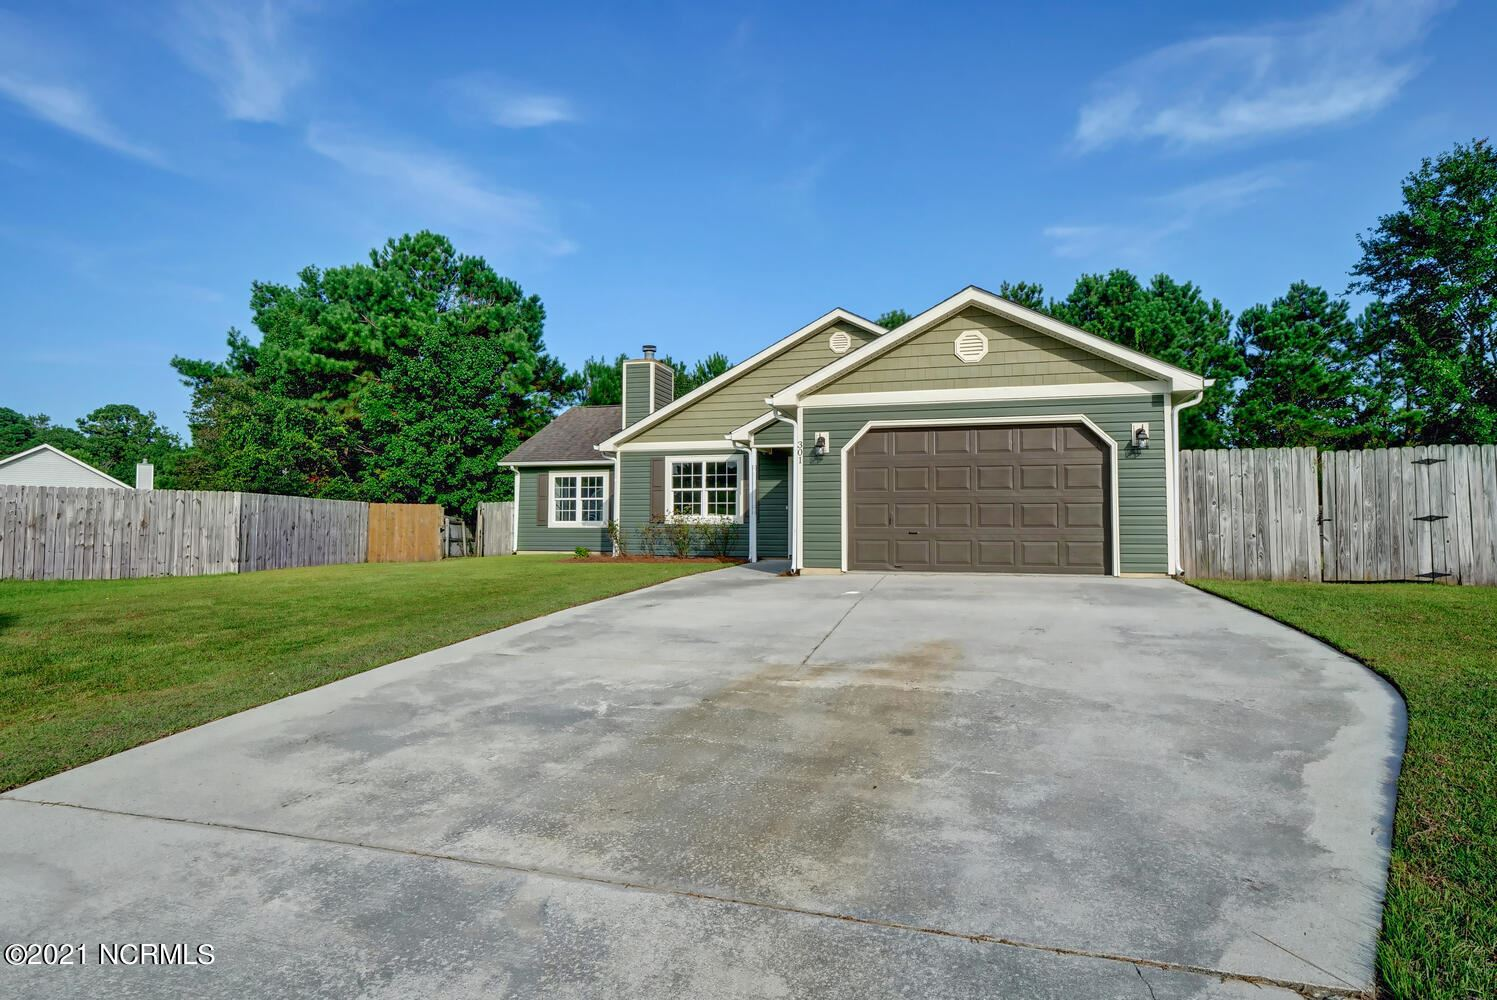 Photo of 301 Foxridge Lane, Hubert, NC 28539 (MLS # 100288479)